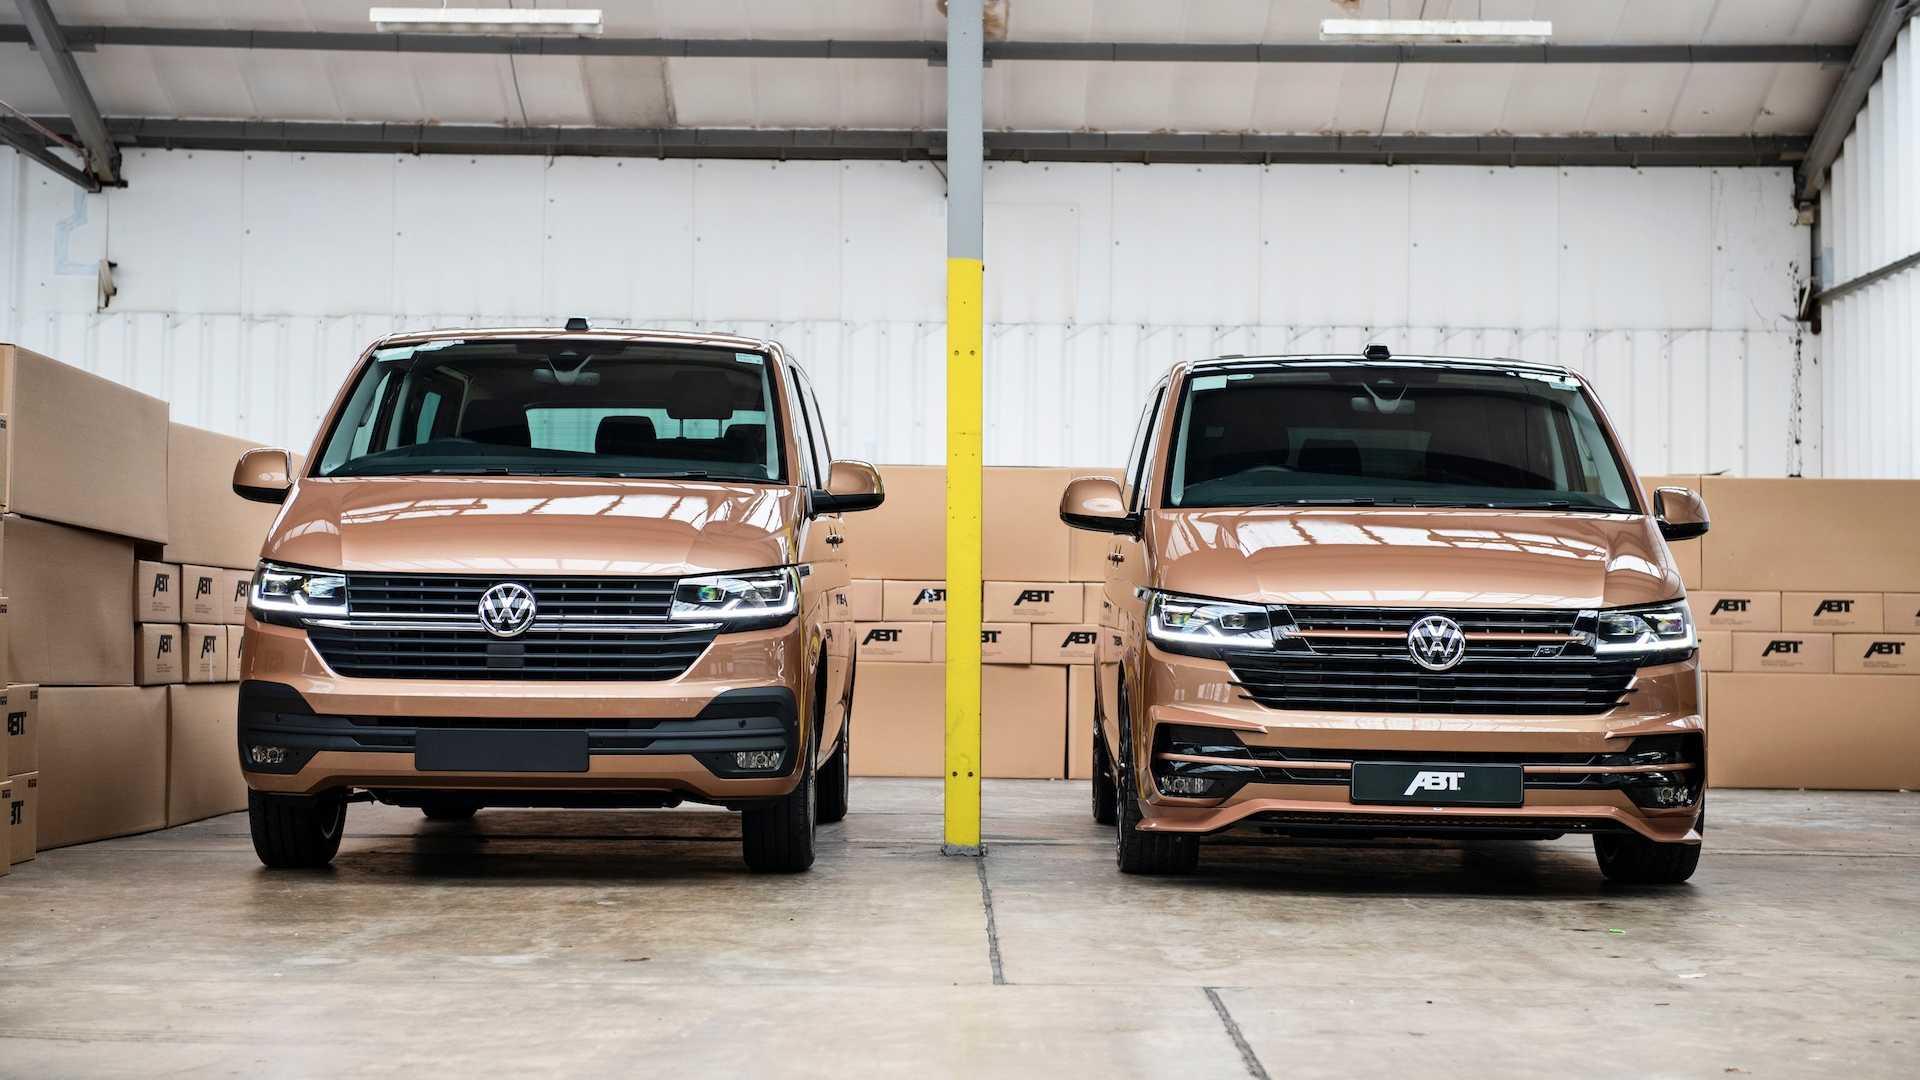 VW-Transporter-by-ABT-2